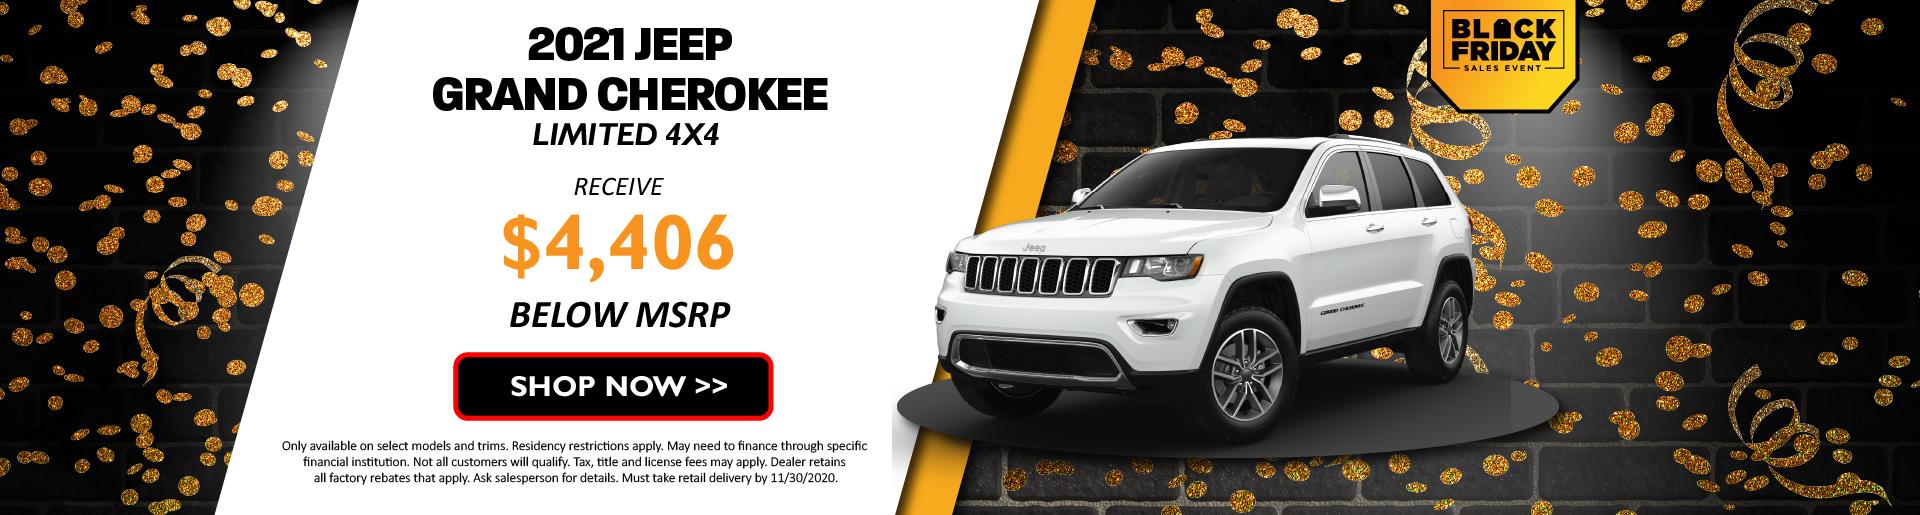 2021 Jeep Grand Cherokee November